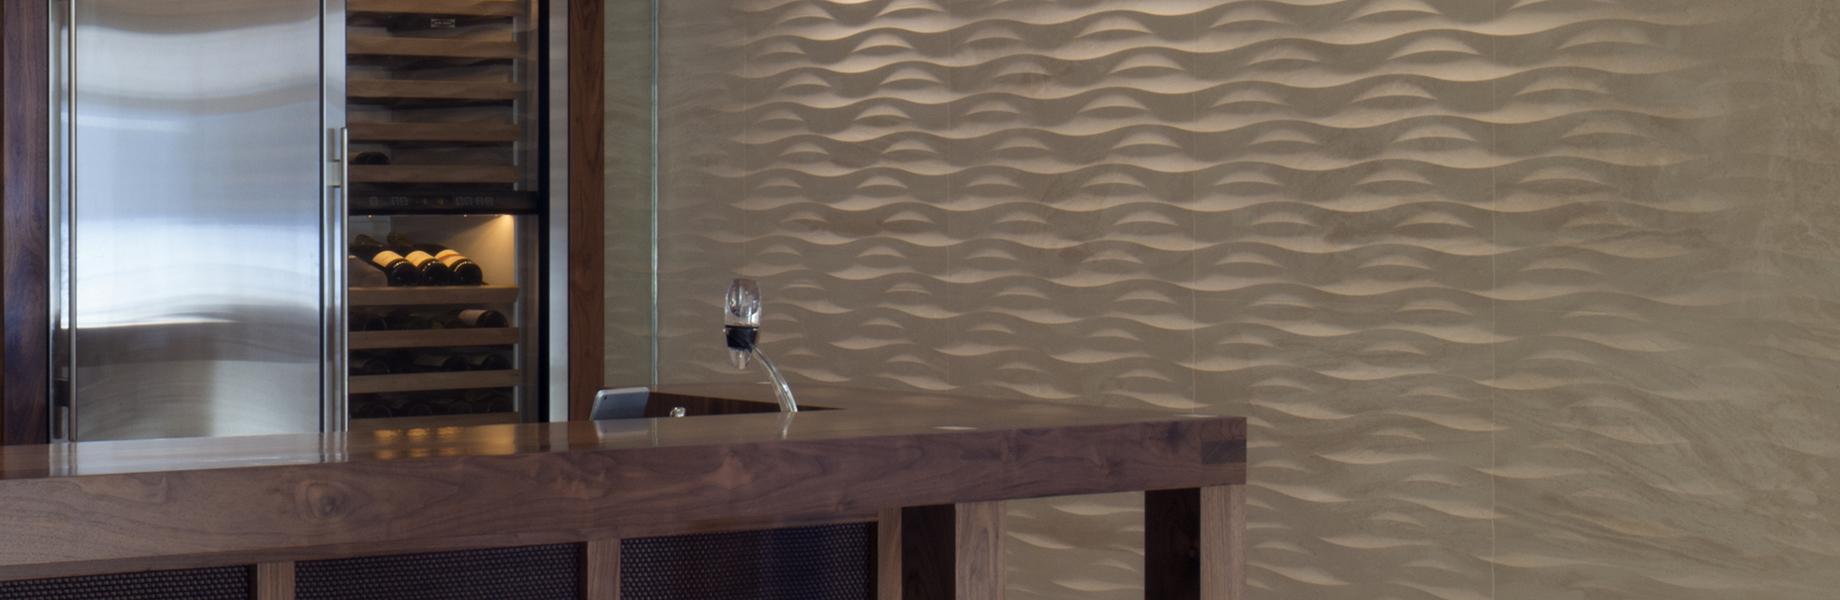 Lithos_Design_fondo_luxury_wall_covering